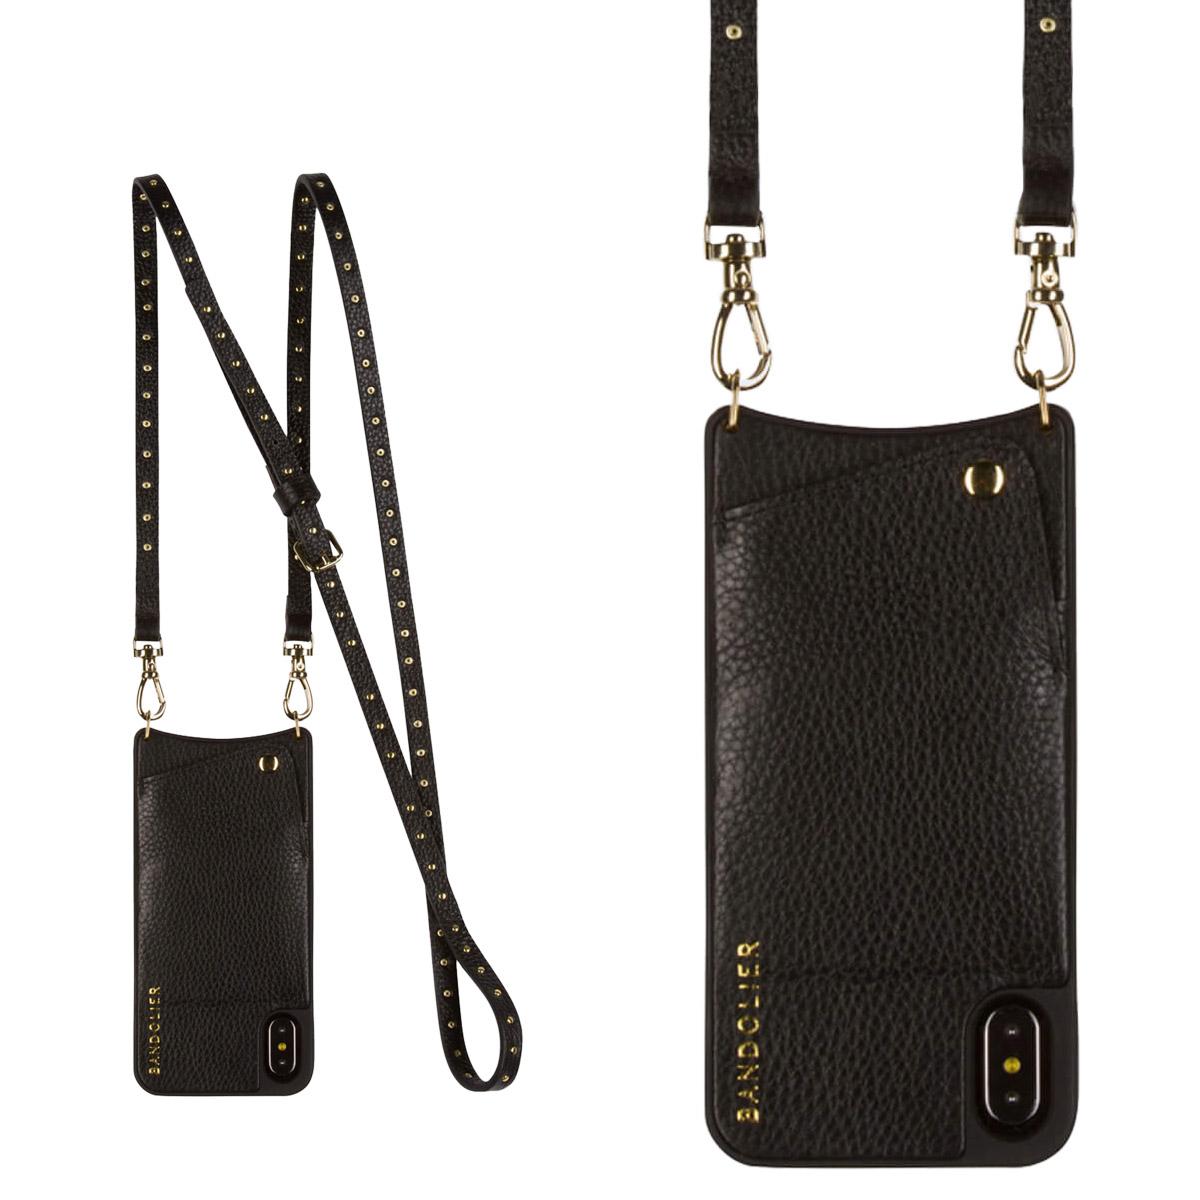 BANDOLIER iPhone XR NICOLE GOLD バンドリヤー ケース ショルダー スマホ アイフォン レザー メンズ レディース ブラック 10NIC1001